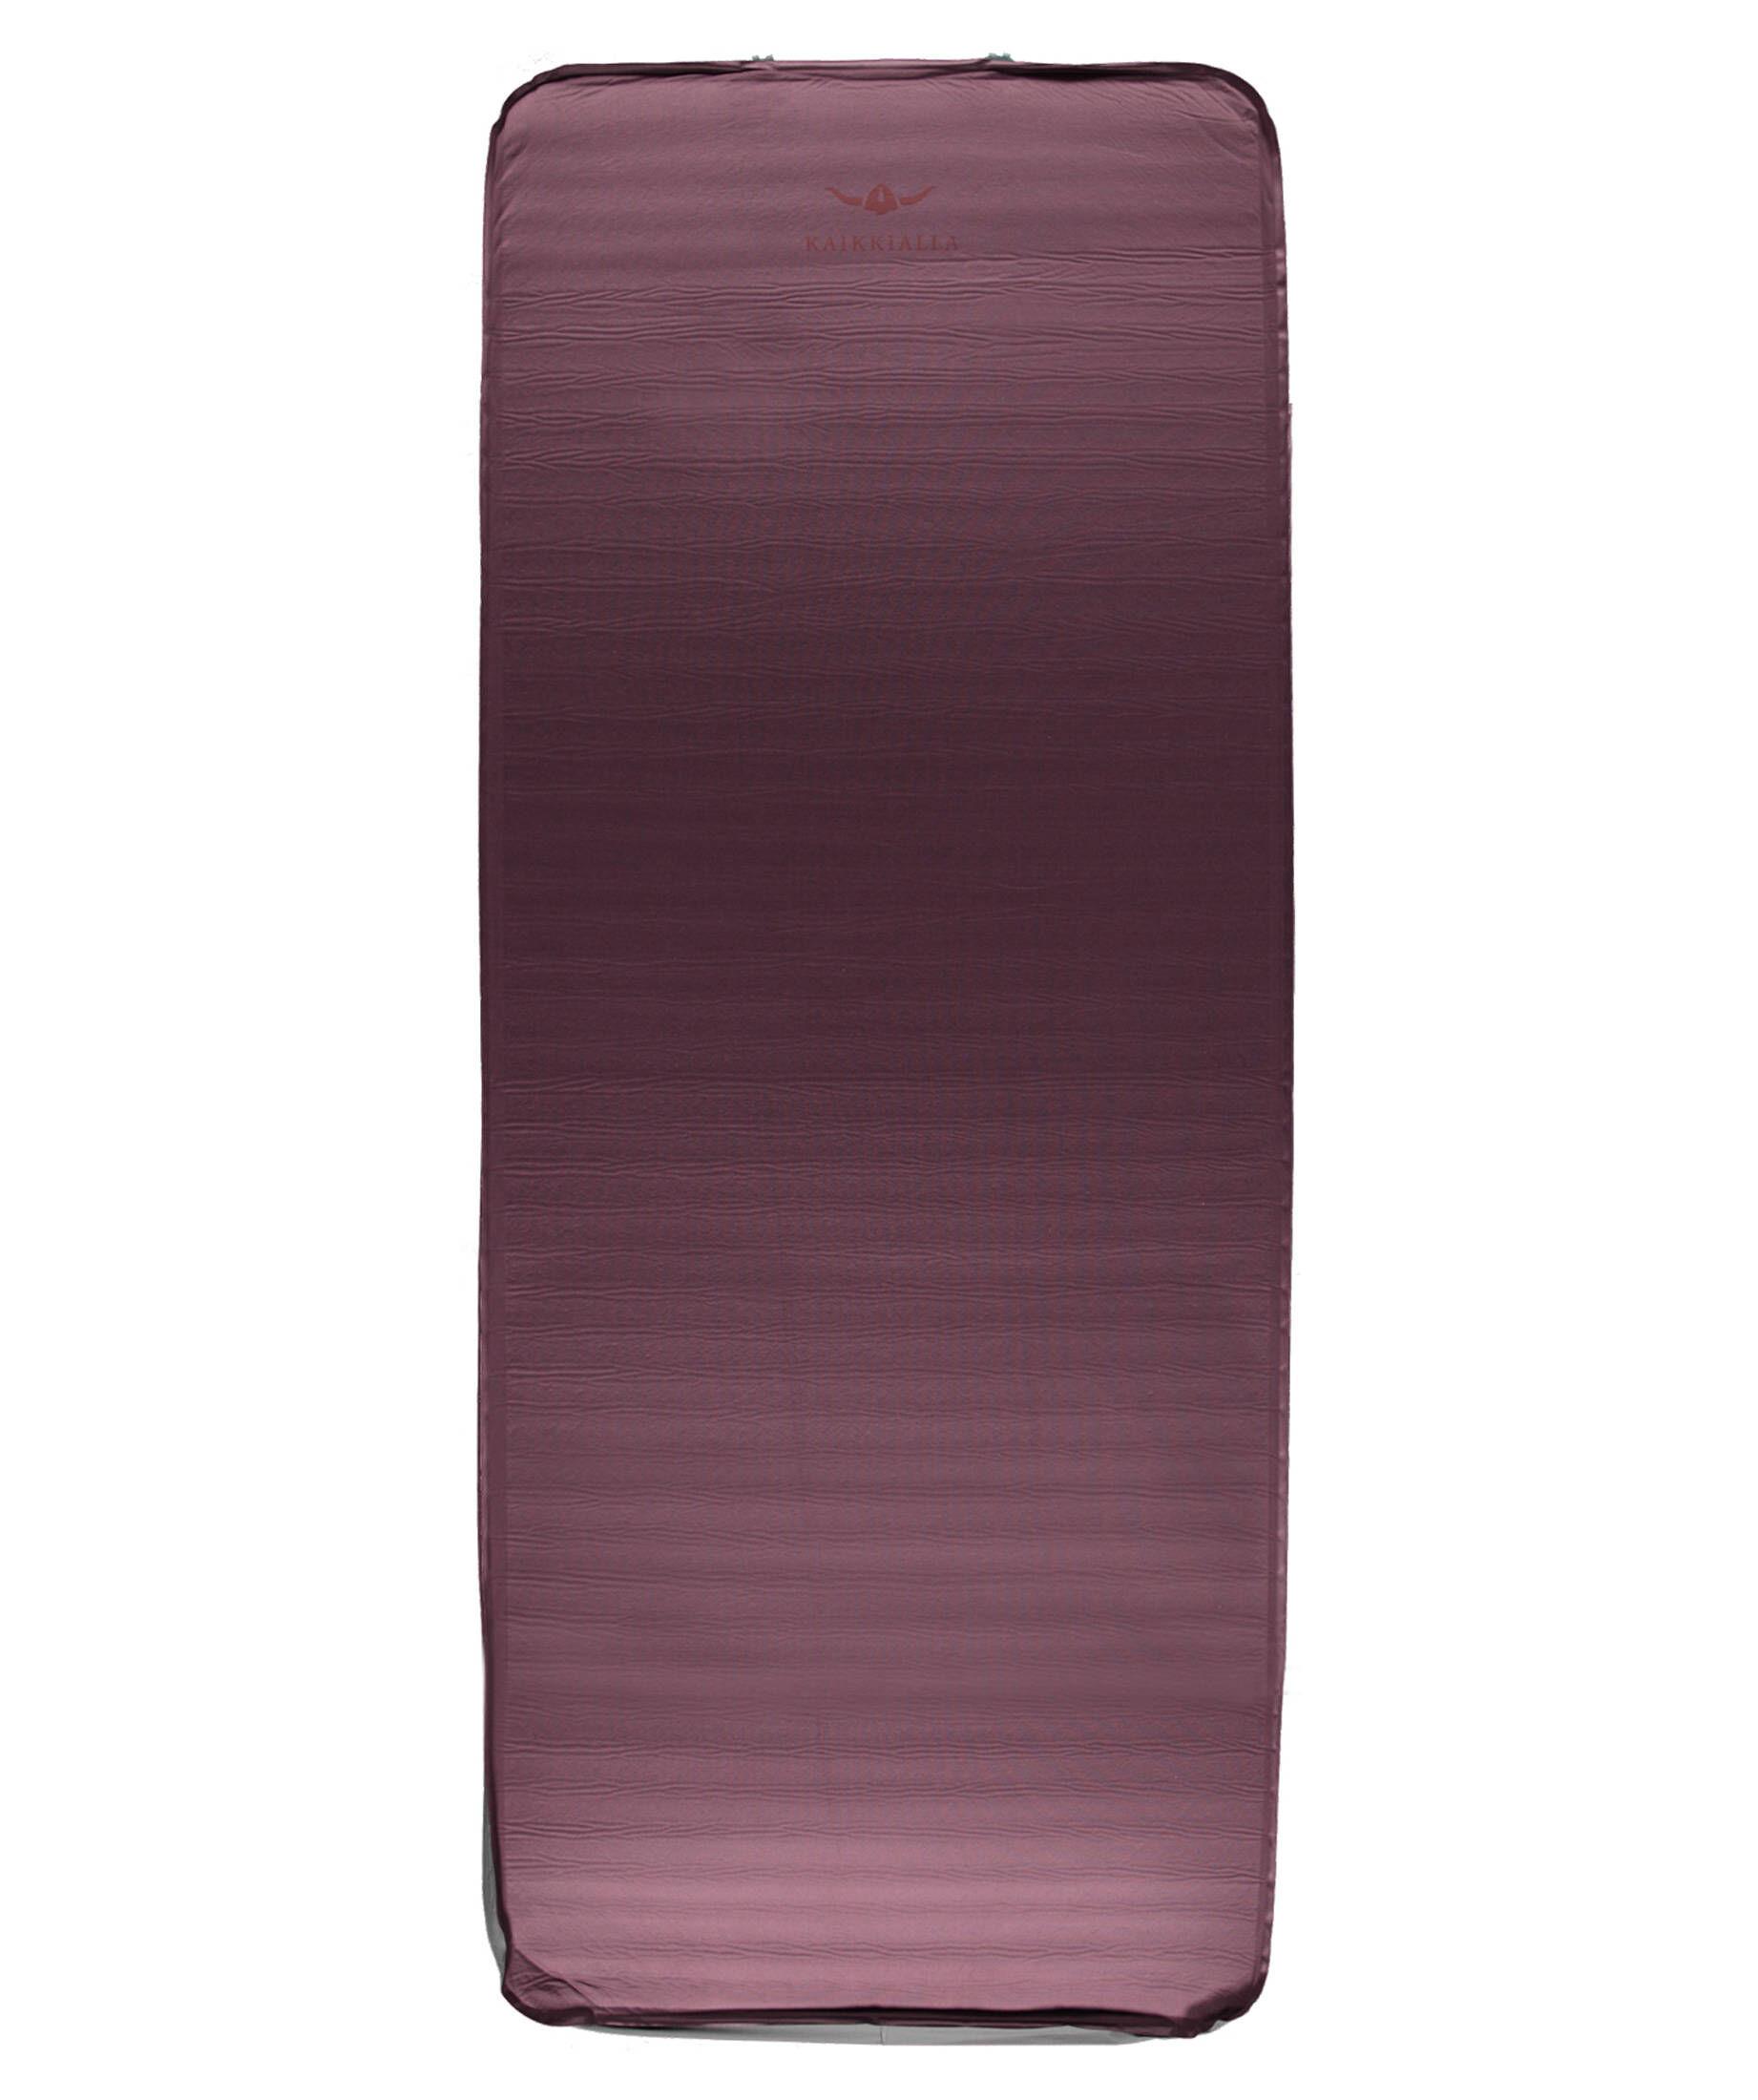 KAIKKIALLA selbstaufblasende Isomatte Stretch Kuopio 7.5 L